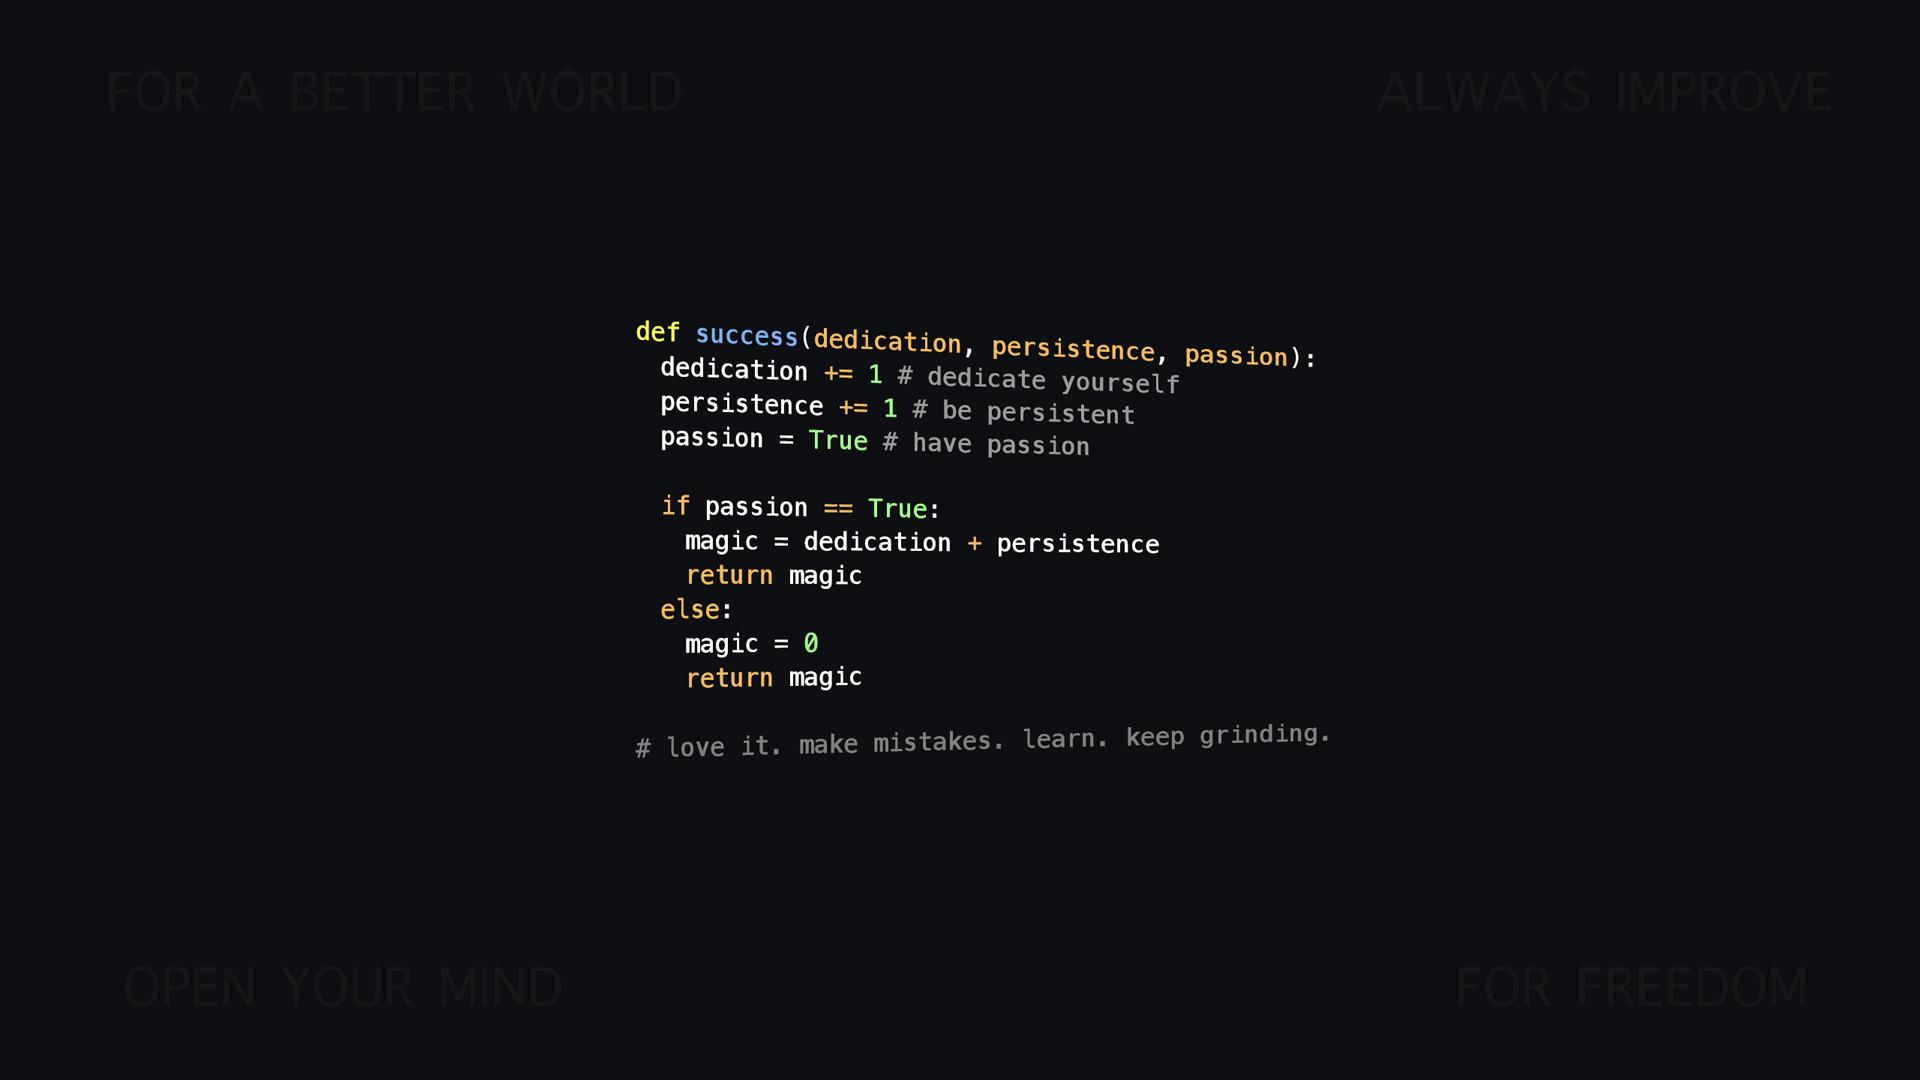 Computer Programming Wallpaper 57 Images